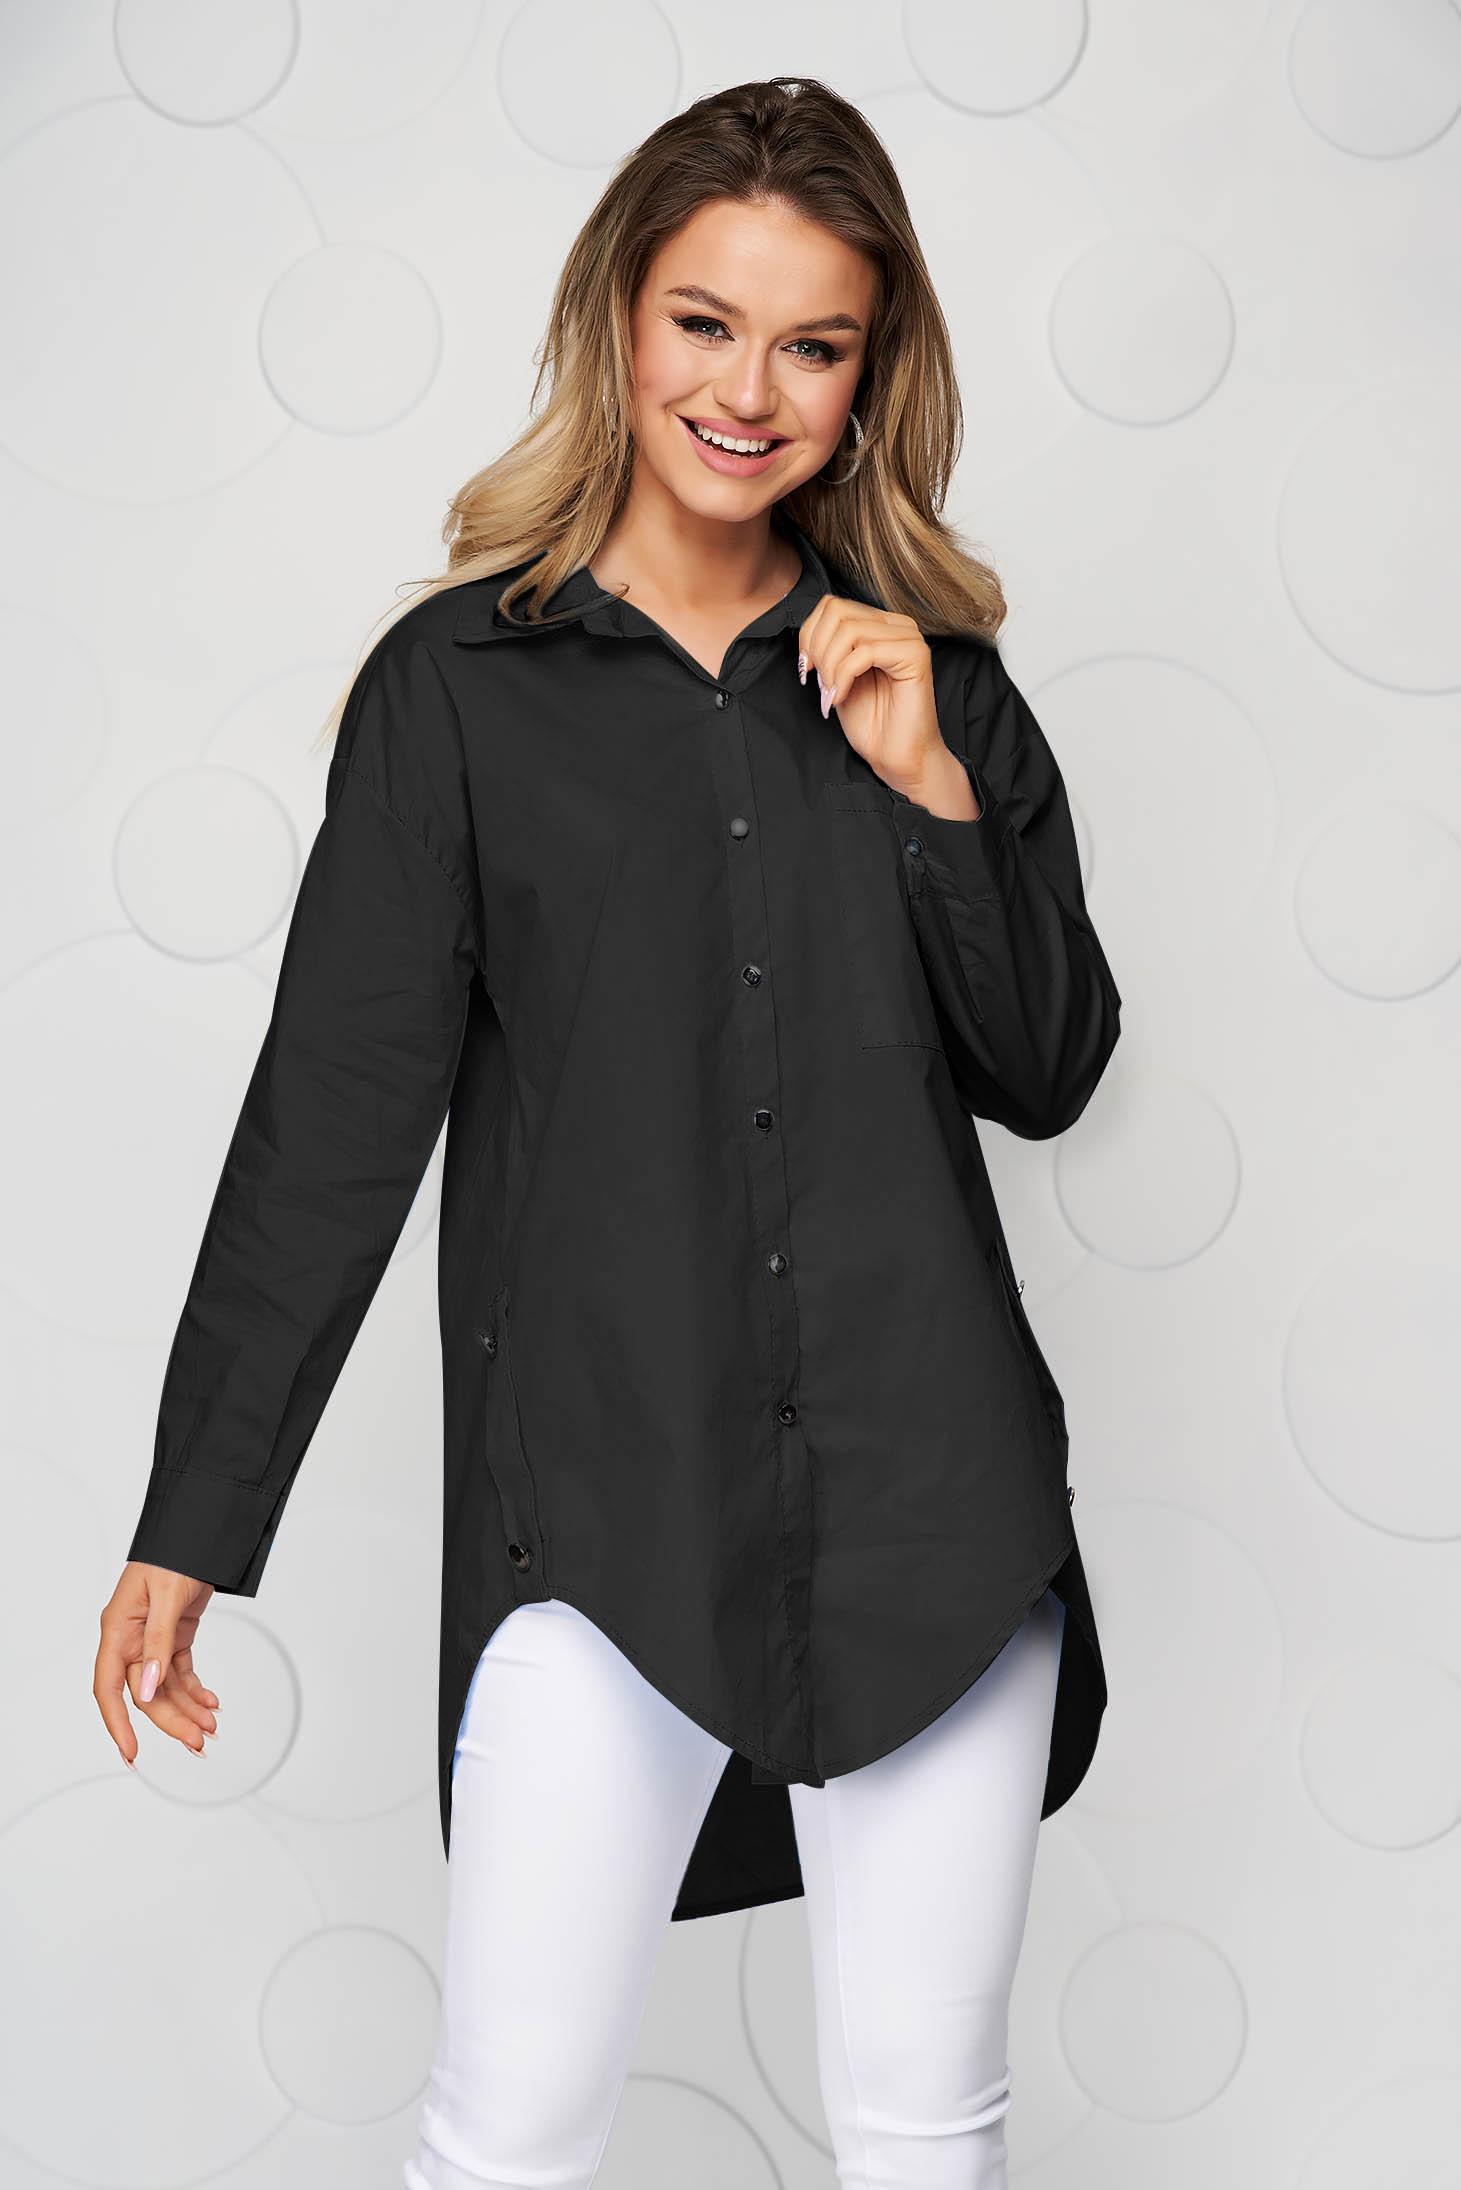 Black casual poplin, thin cotton women`s shirt asymmetrical loose fit